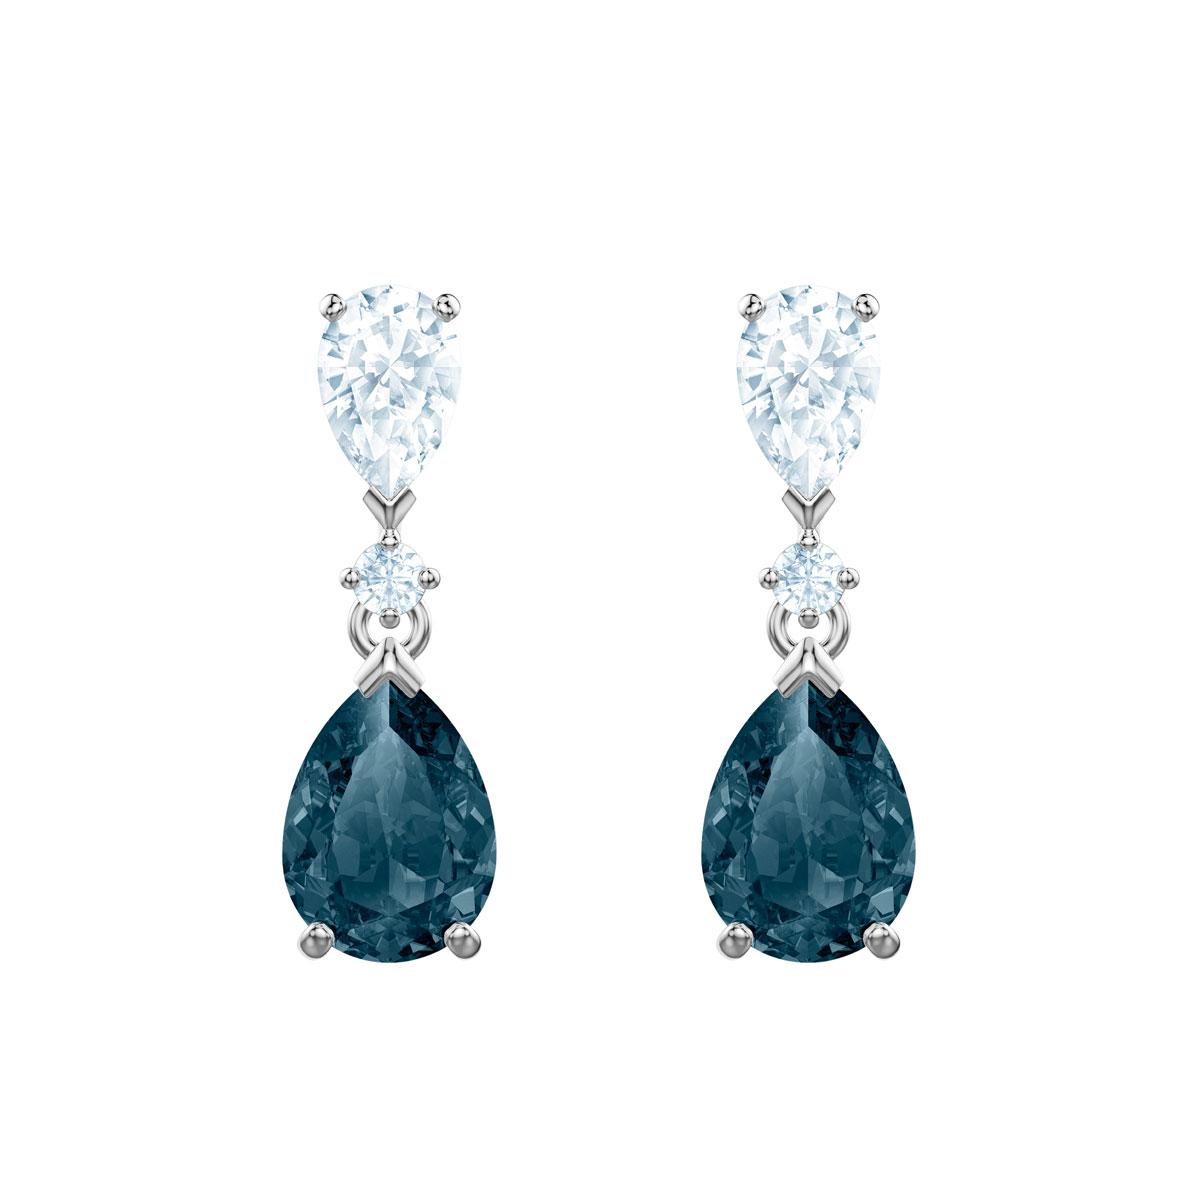 Swarovski Vintage Pierced Earrings, Blue, Rhodium